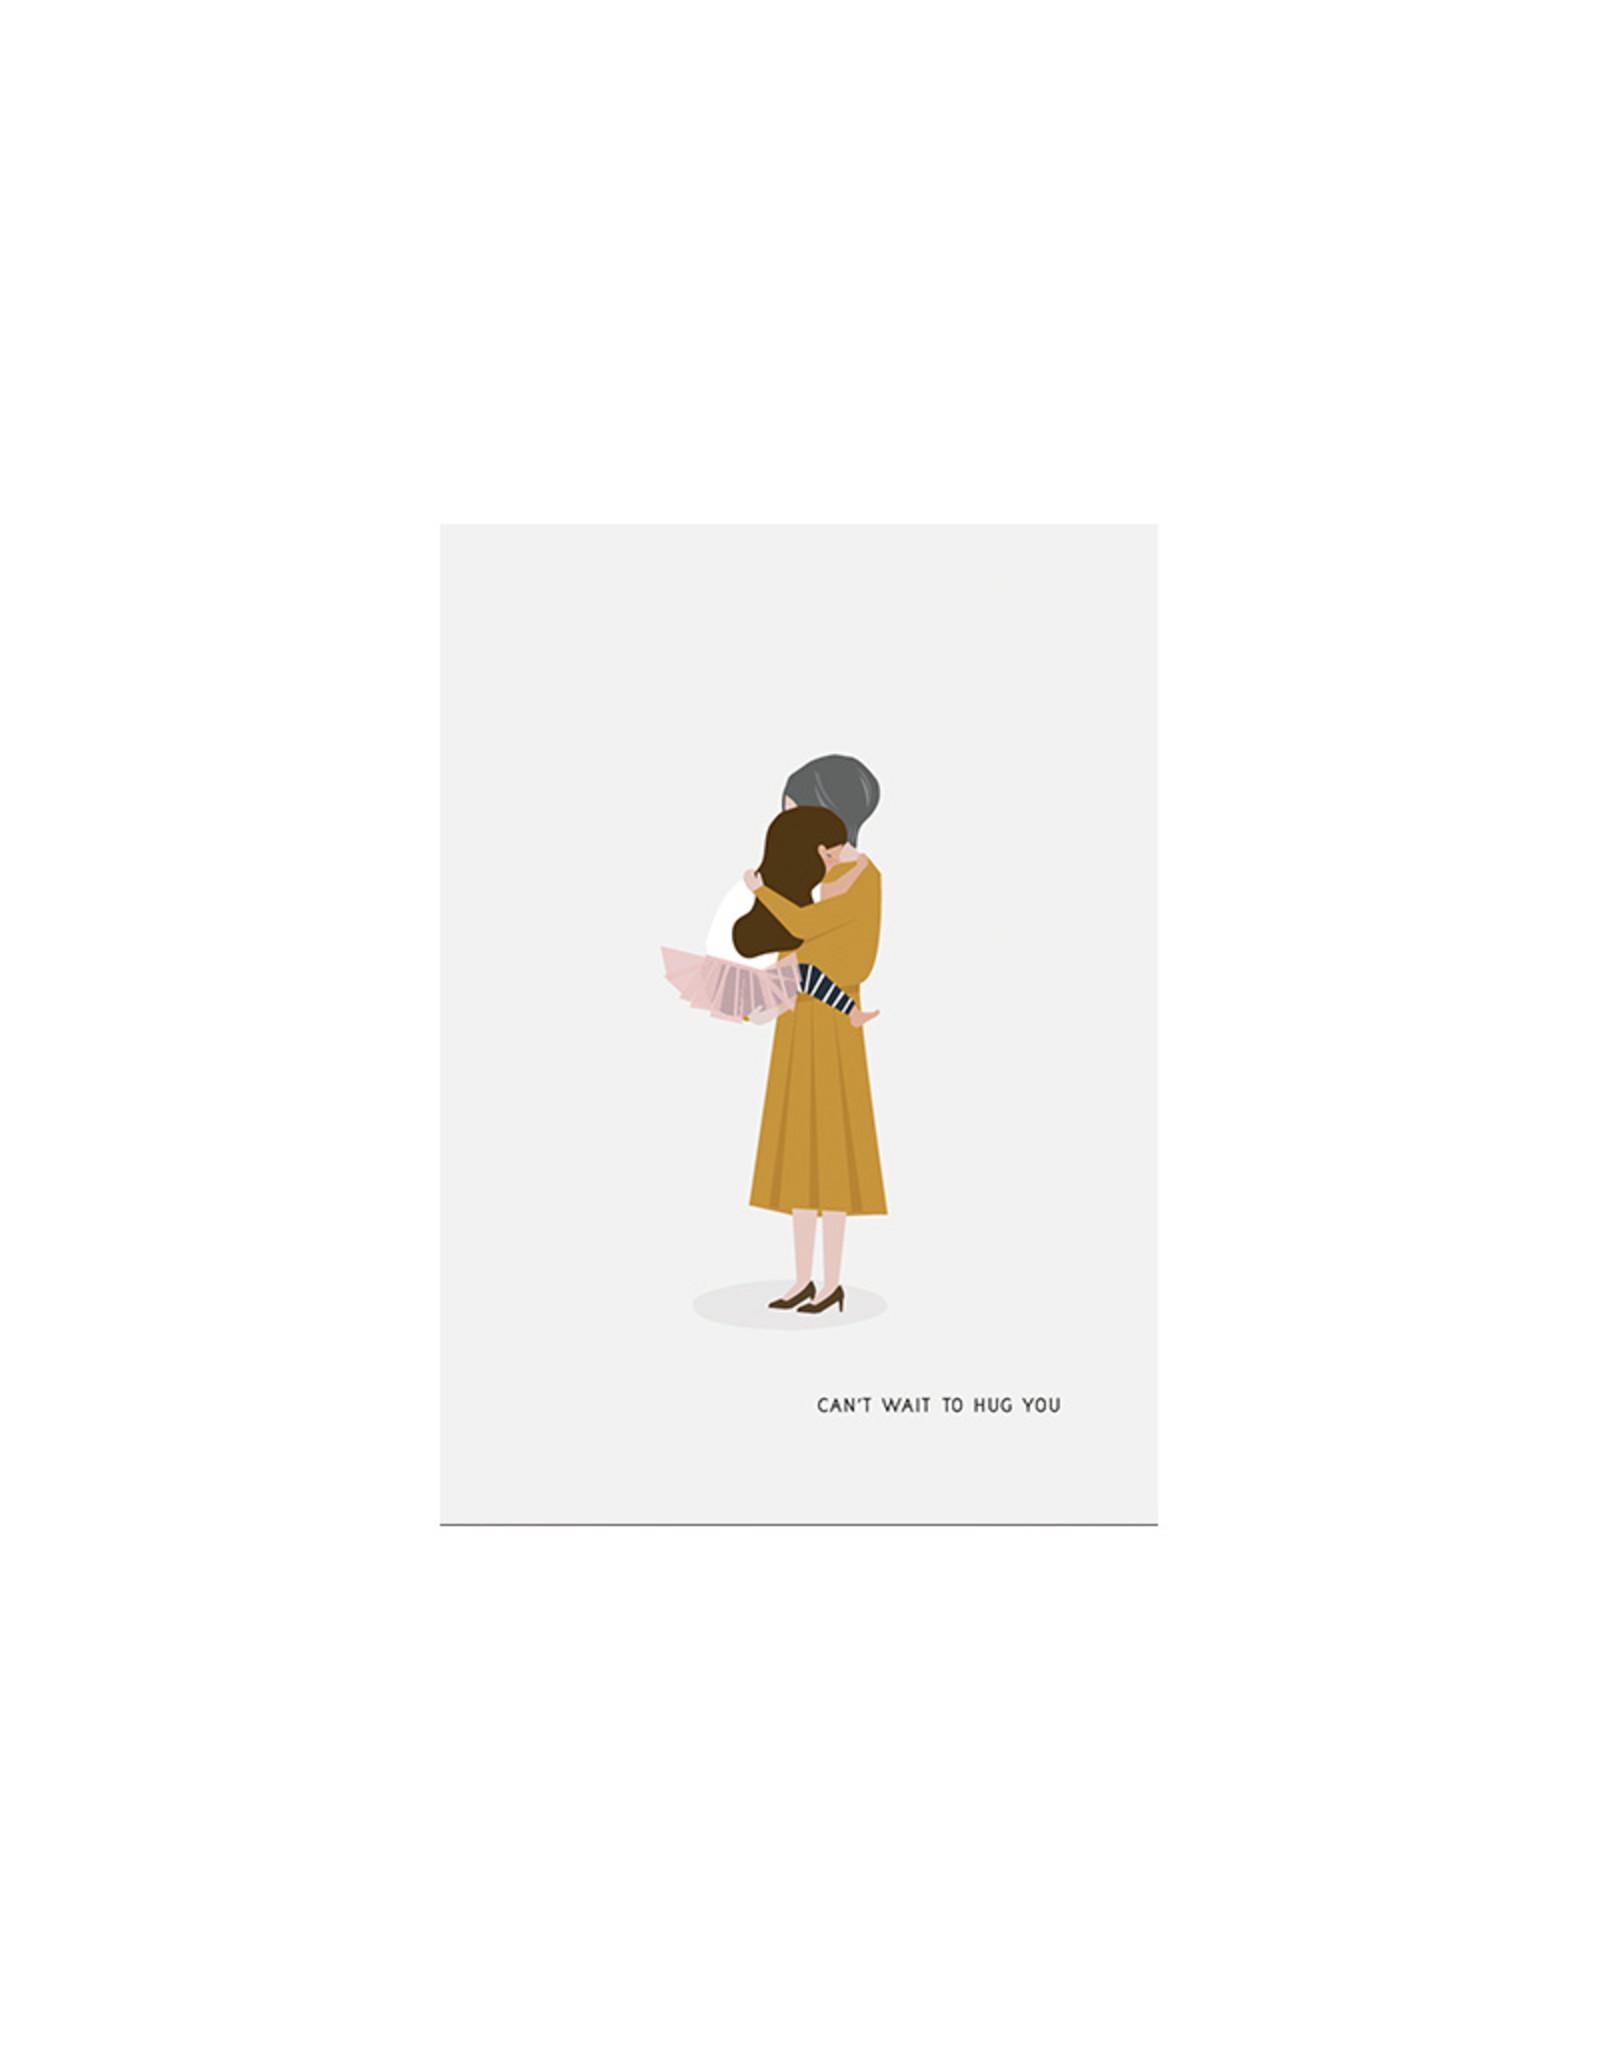 Brein Boerderei Knuffelkaart - Can't wait to hug you - Oma